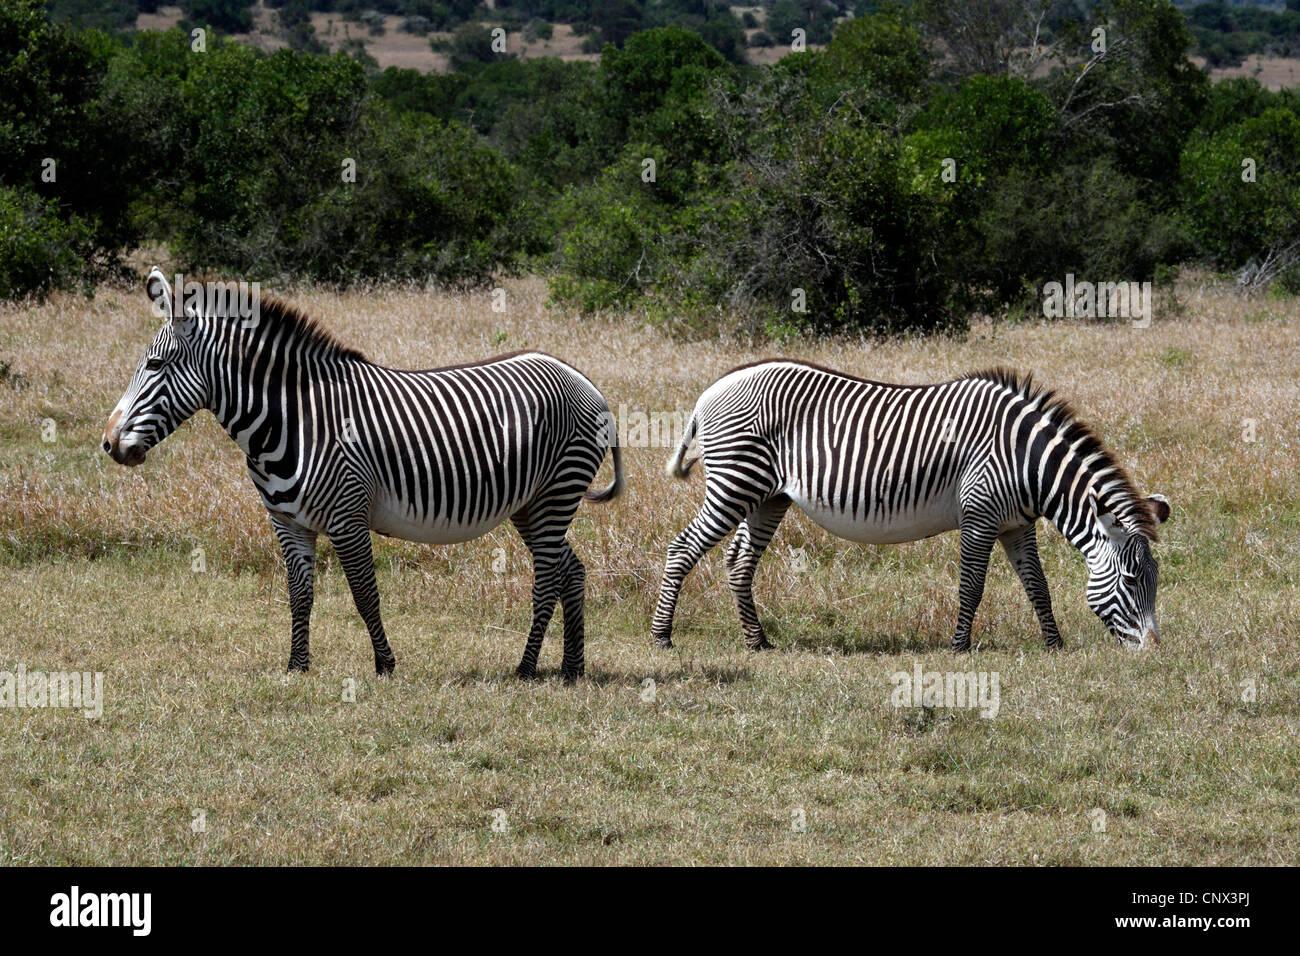 Grevy's zebra (Equus grevyi), grazing, Kenya, Sweetwaters Game Reserve Stock Photo